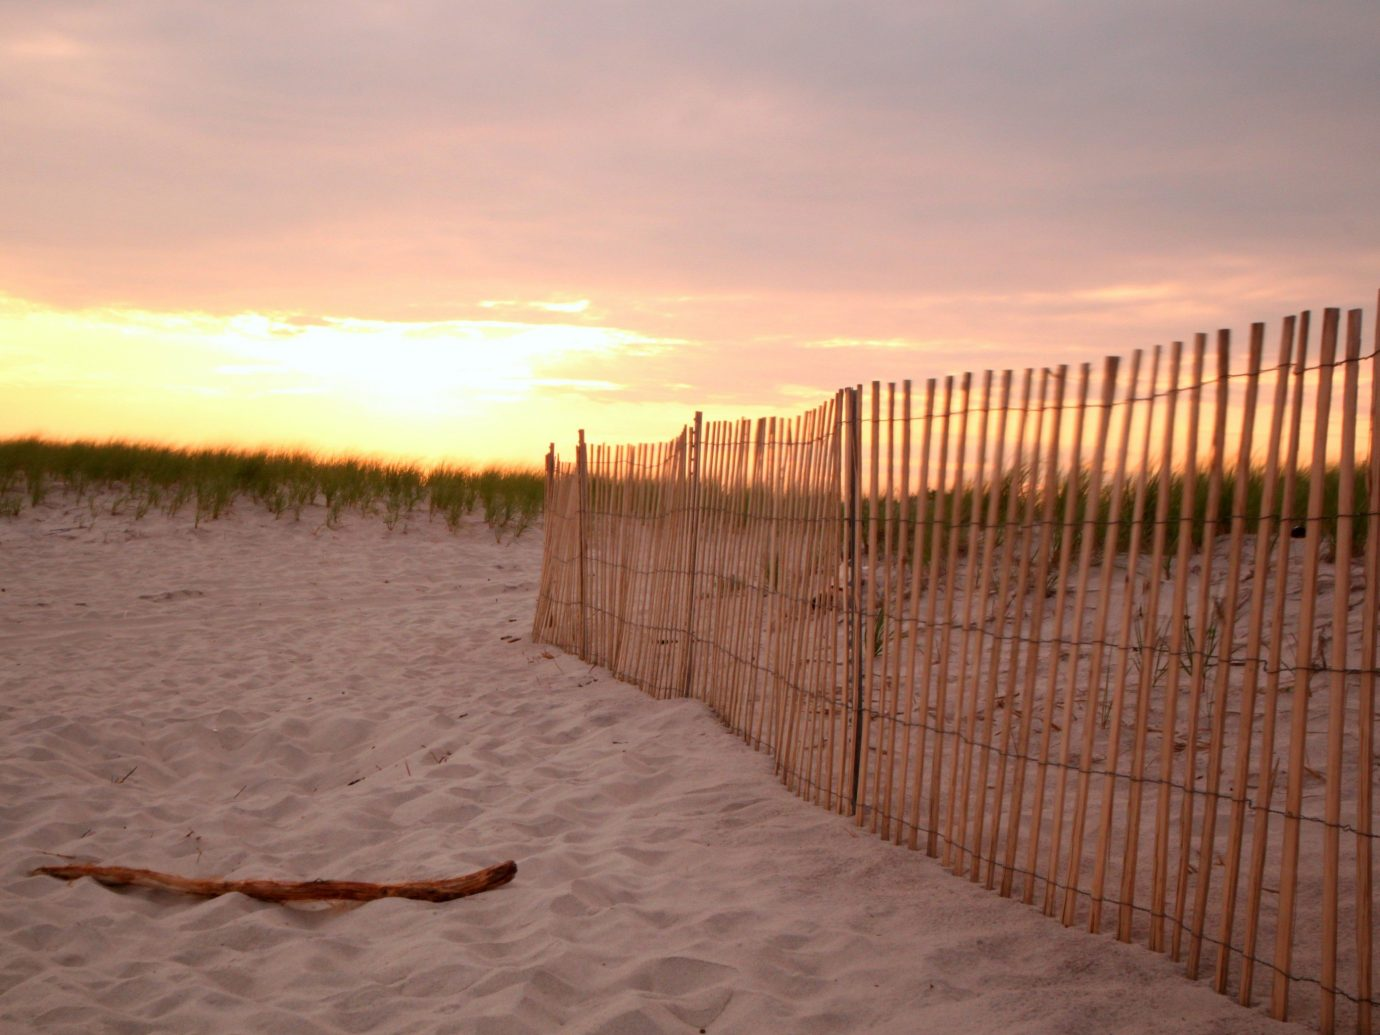 Trip Ideas sky outdoor Sunset morning Beach sunlight Sea wood walkway sand Fence outdoor structure sunrise